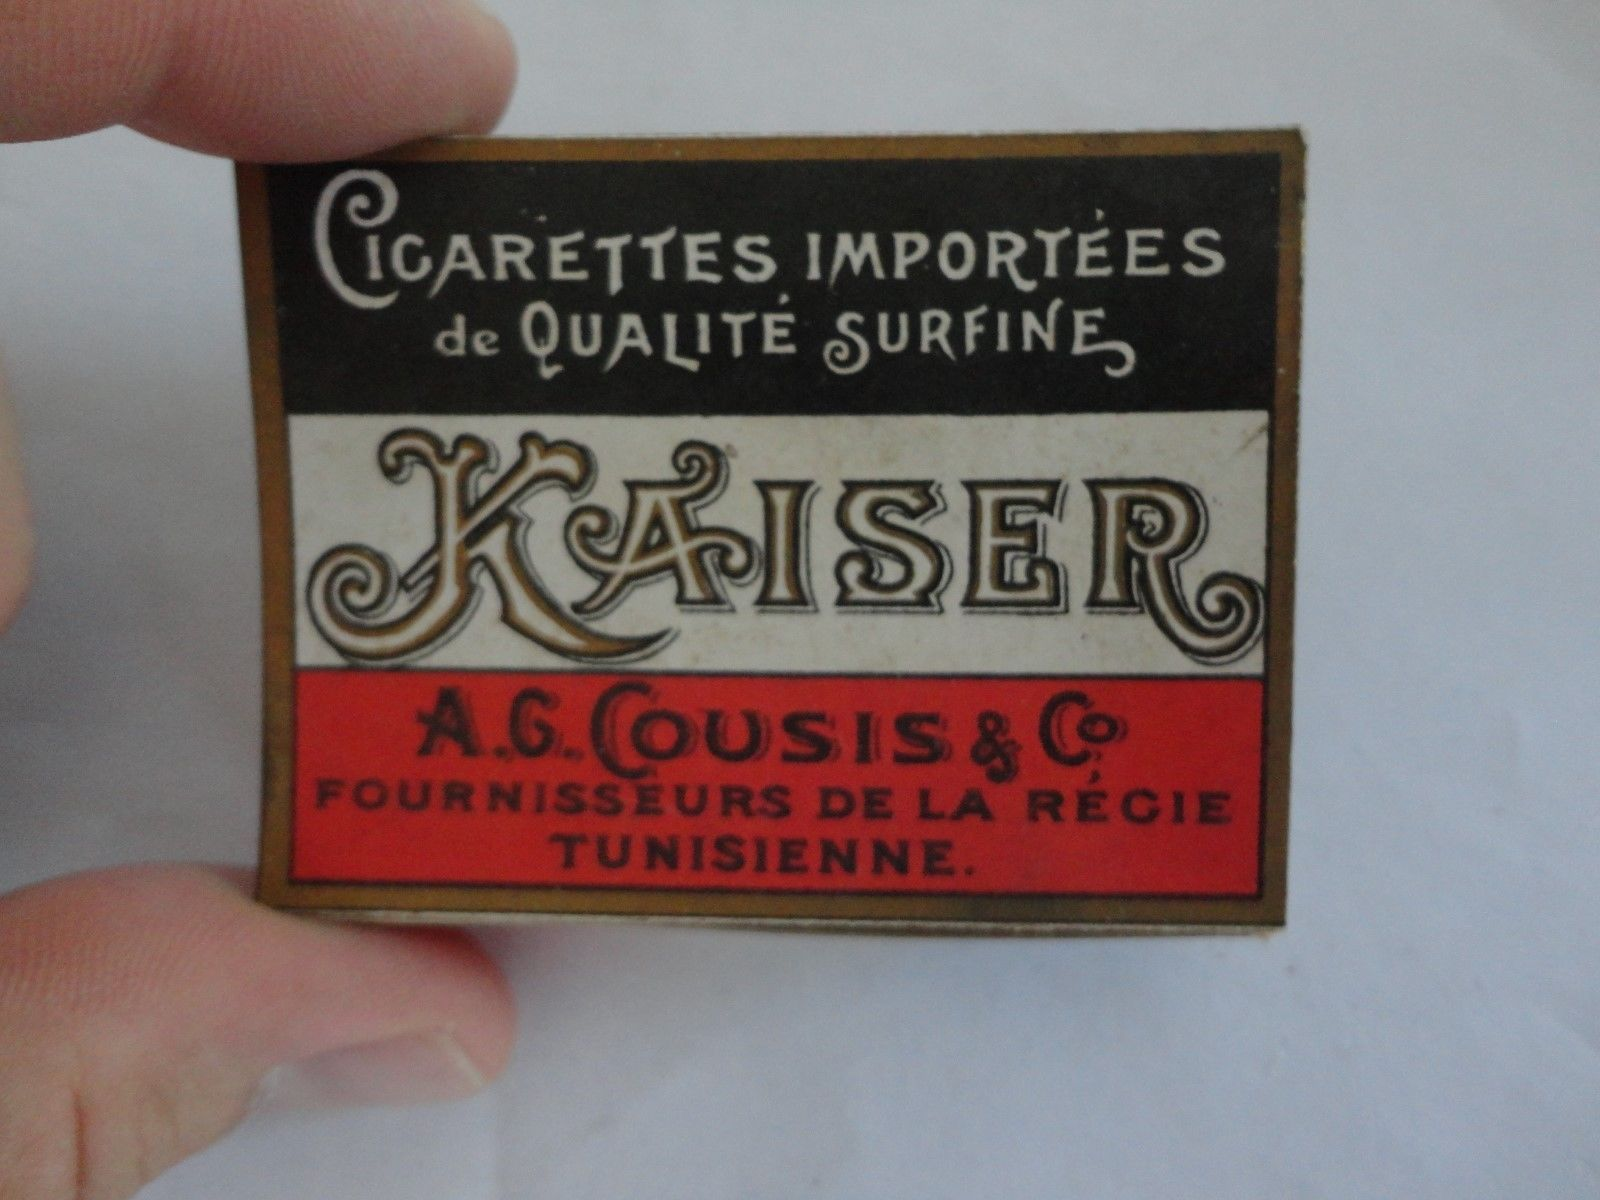 Pin on Harry Rag's Full/Sealed/Live Cigarette Packets